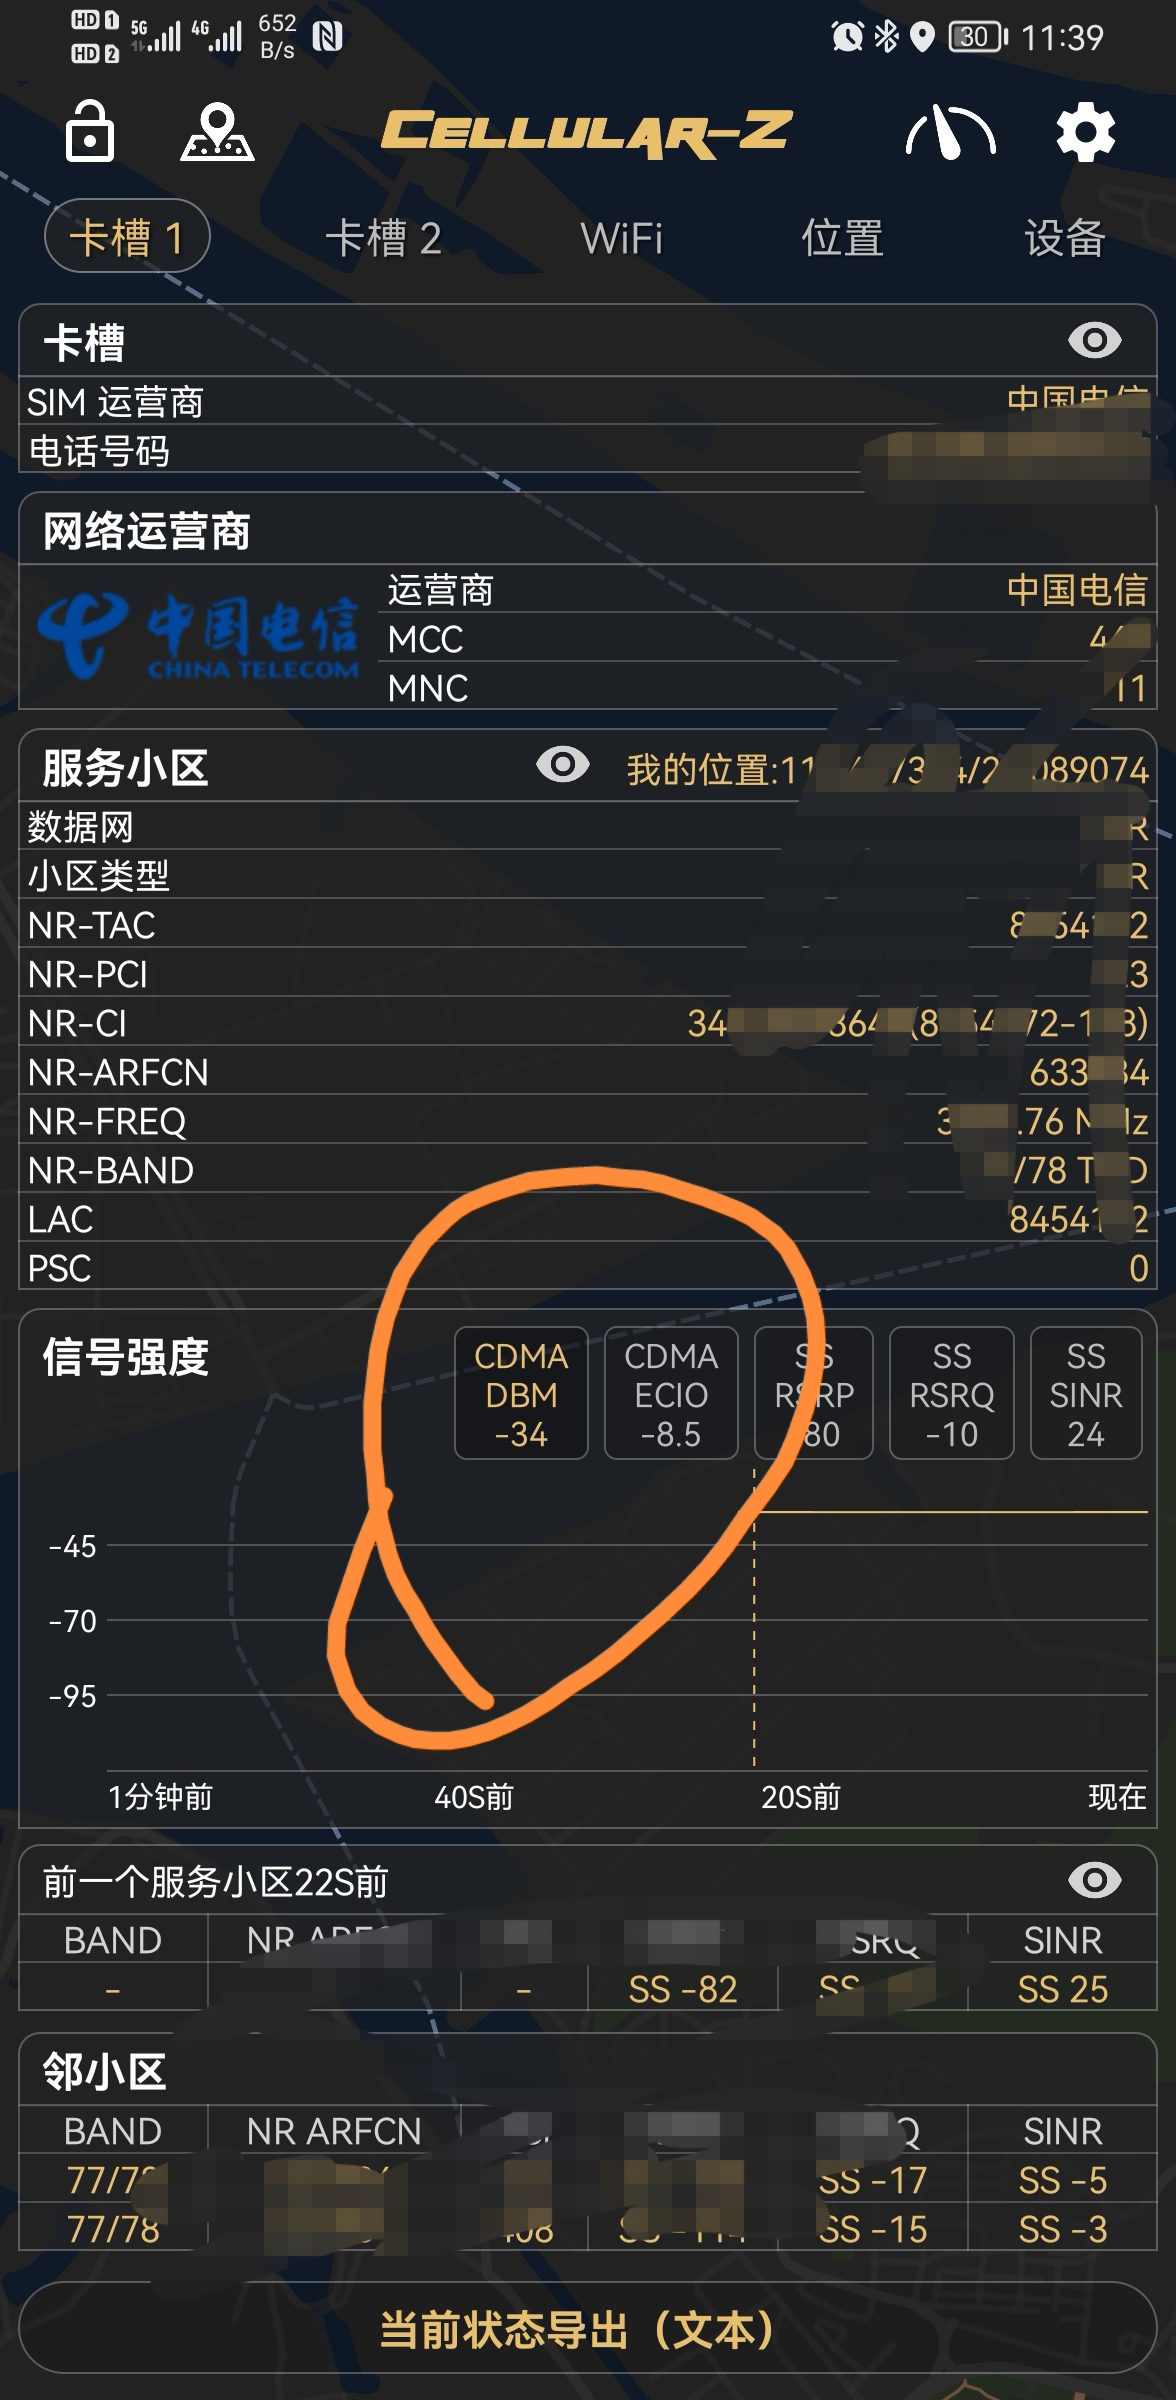 Screenshot_20210611_233956_make.more.r2d2.cellular_z_edit_156100305207950.jpg